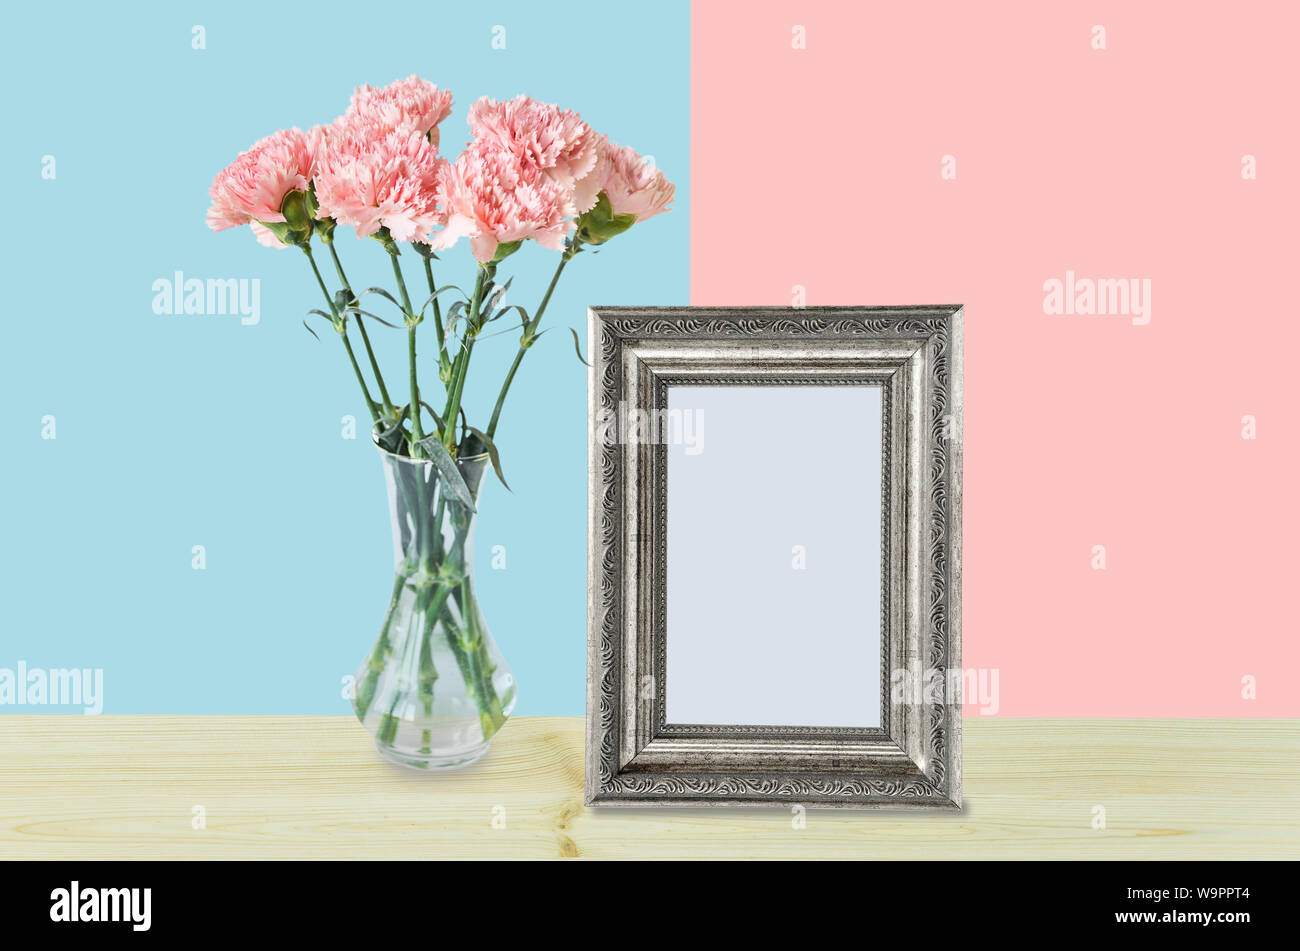 blue decorative vases.htm pink carnations in vase stock photos   pink carnations in vase  pink carnations in vase stock photos